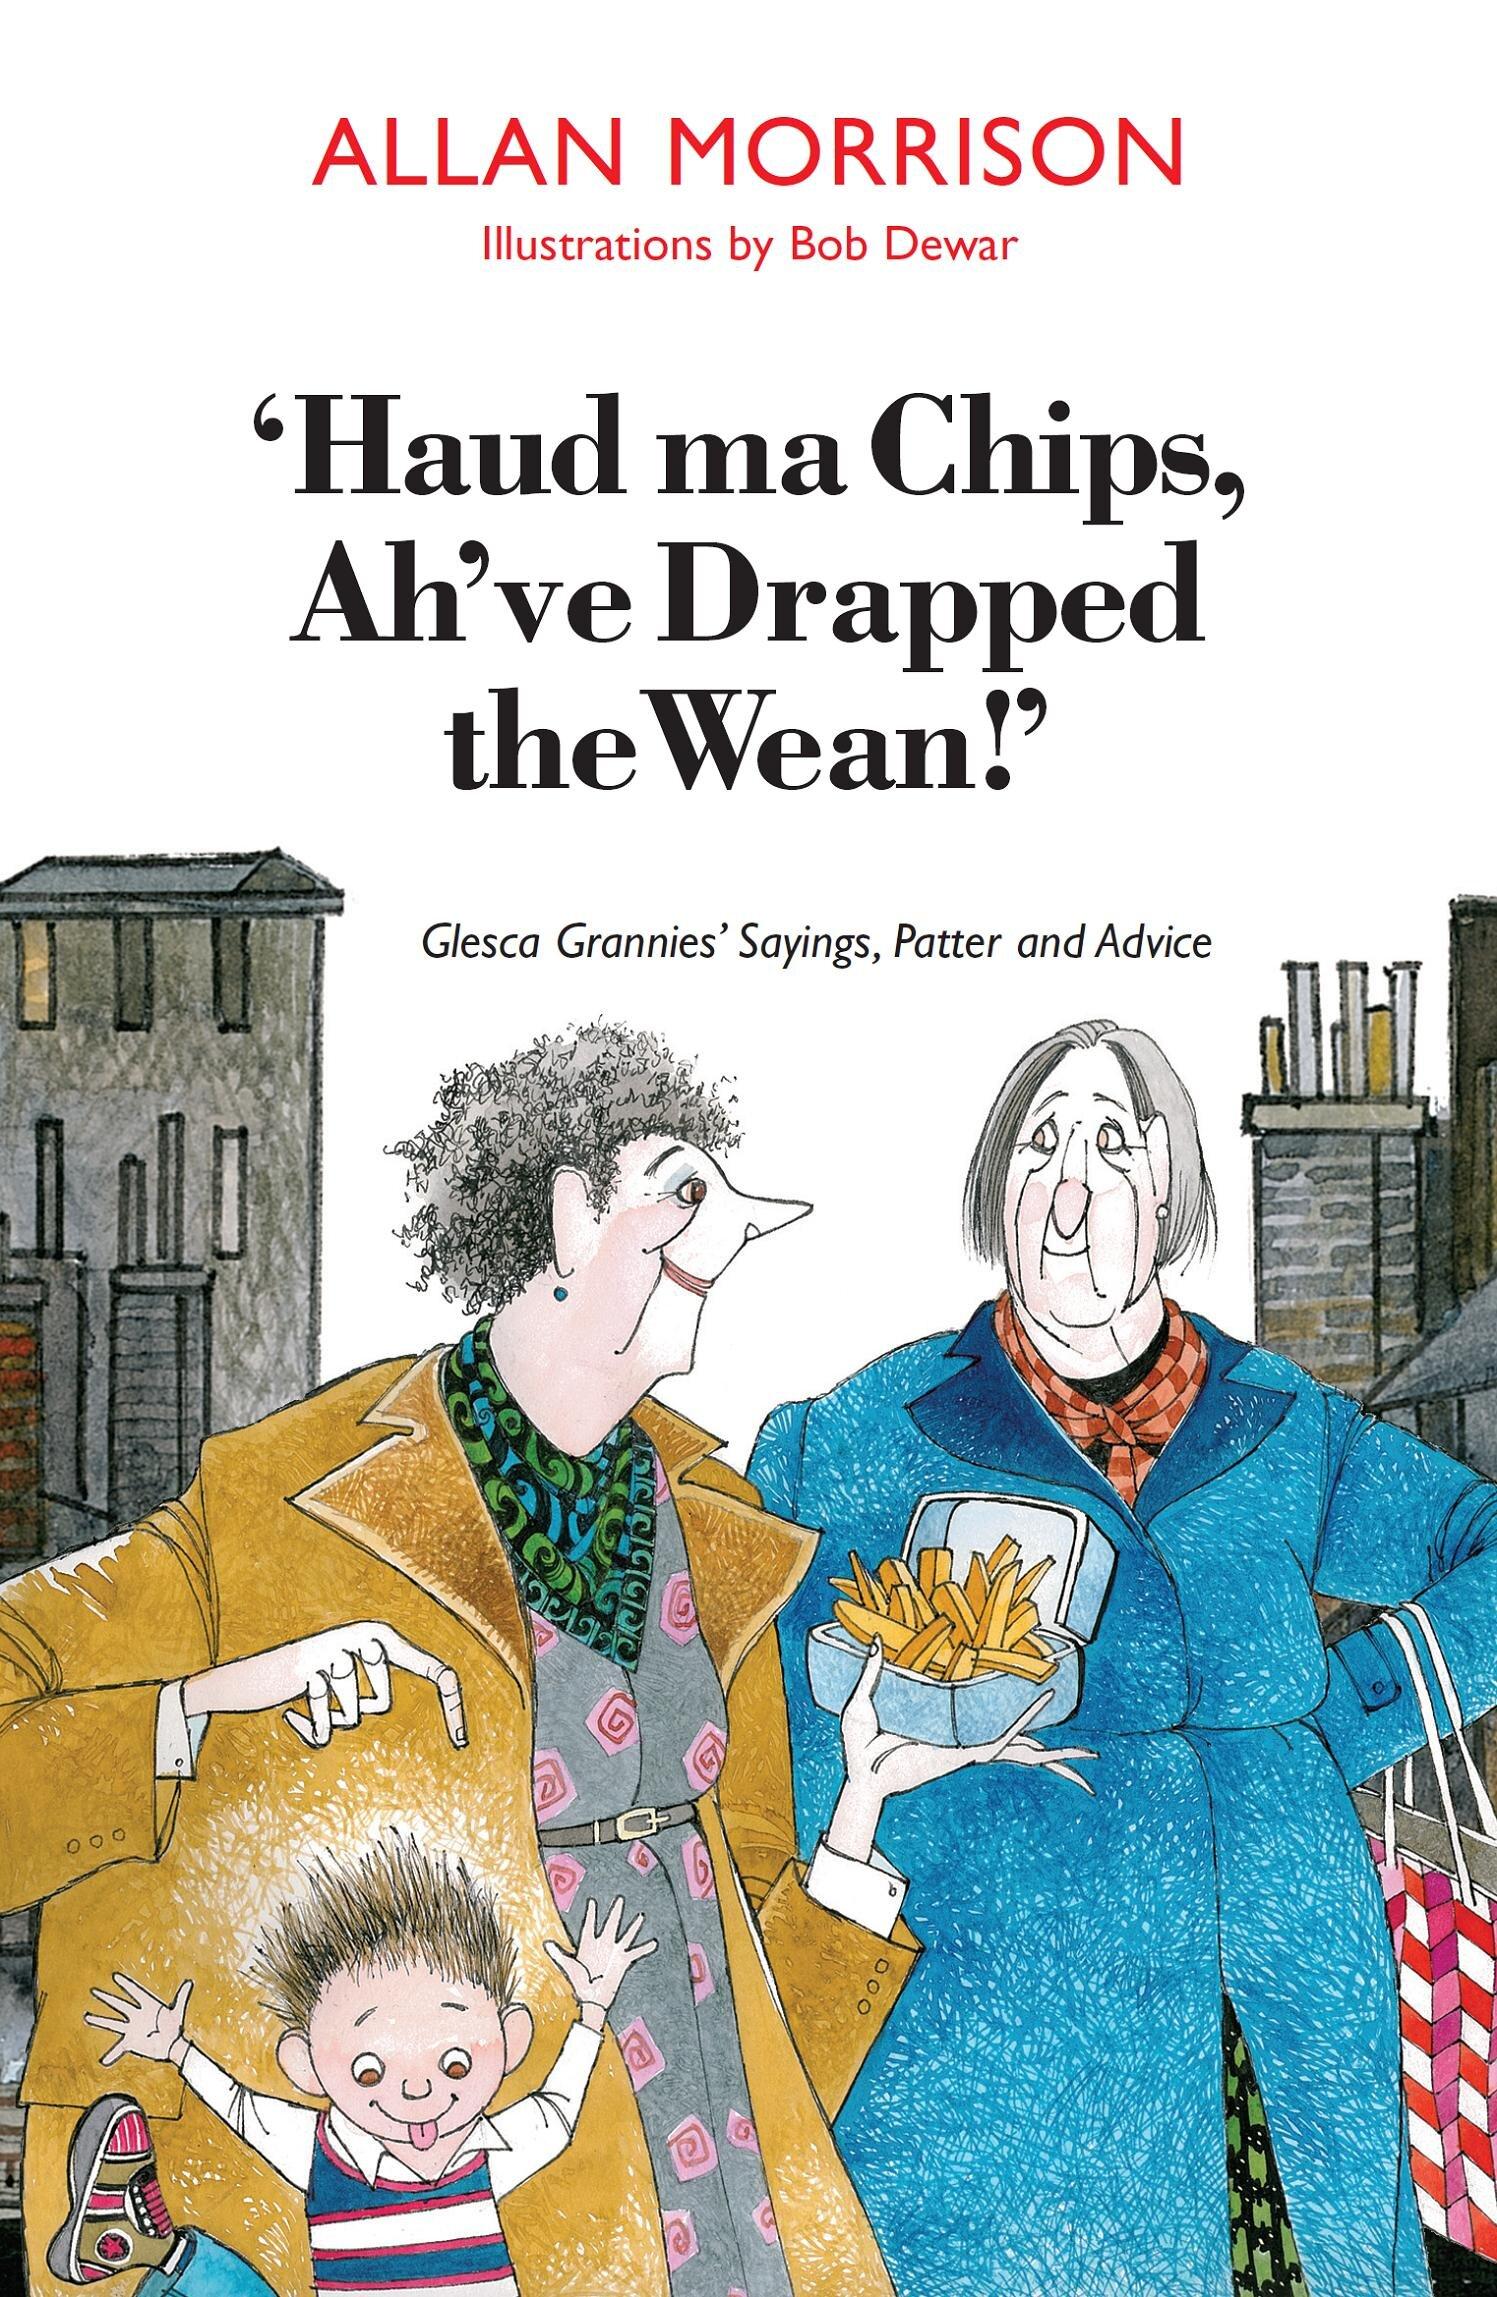 'Haud ma Chips, Ah've Drapped the Wean!' Allan Morrison 9781908373472 Luath Press.jpg